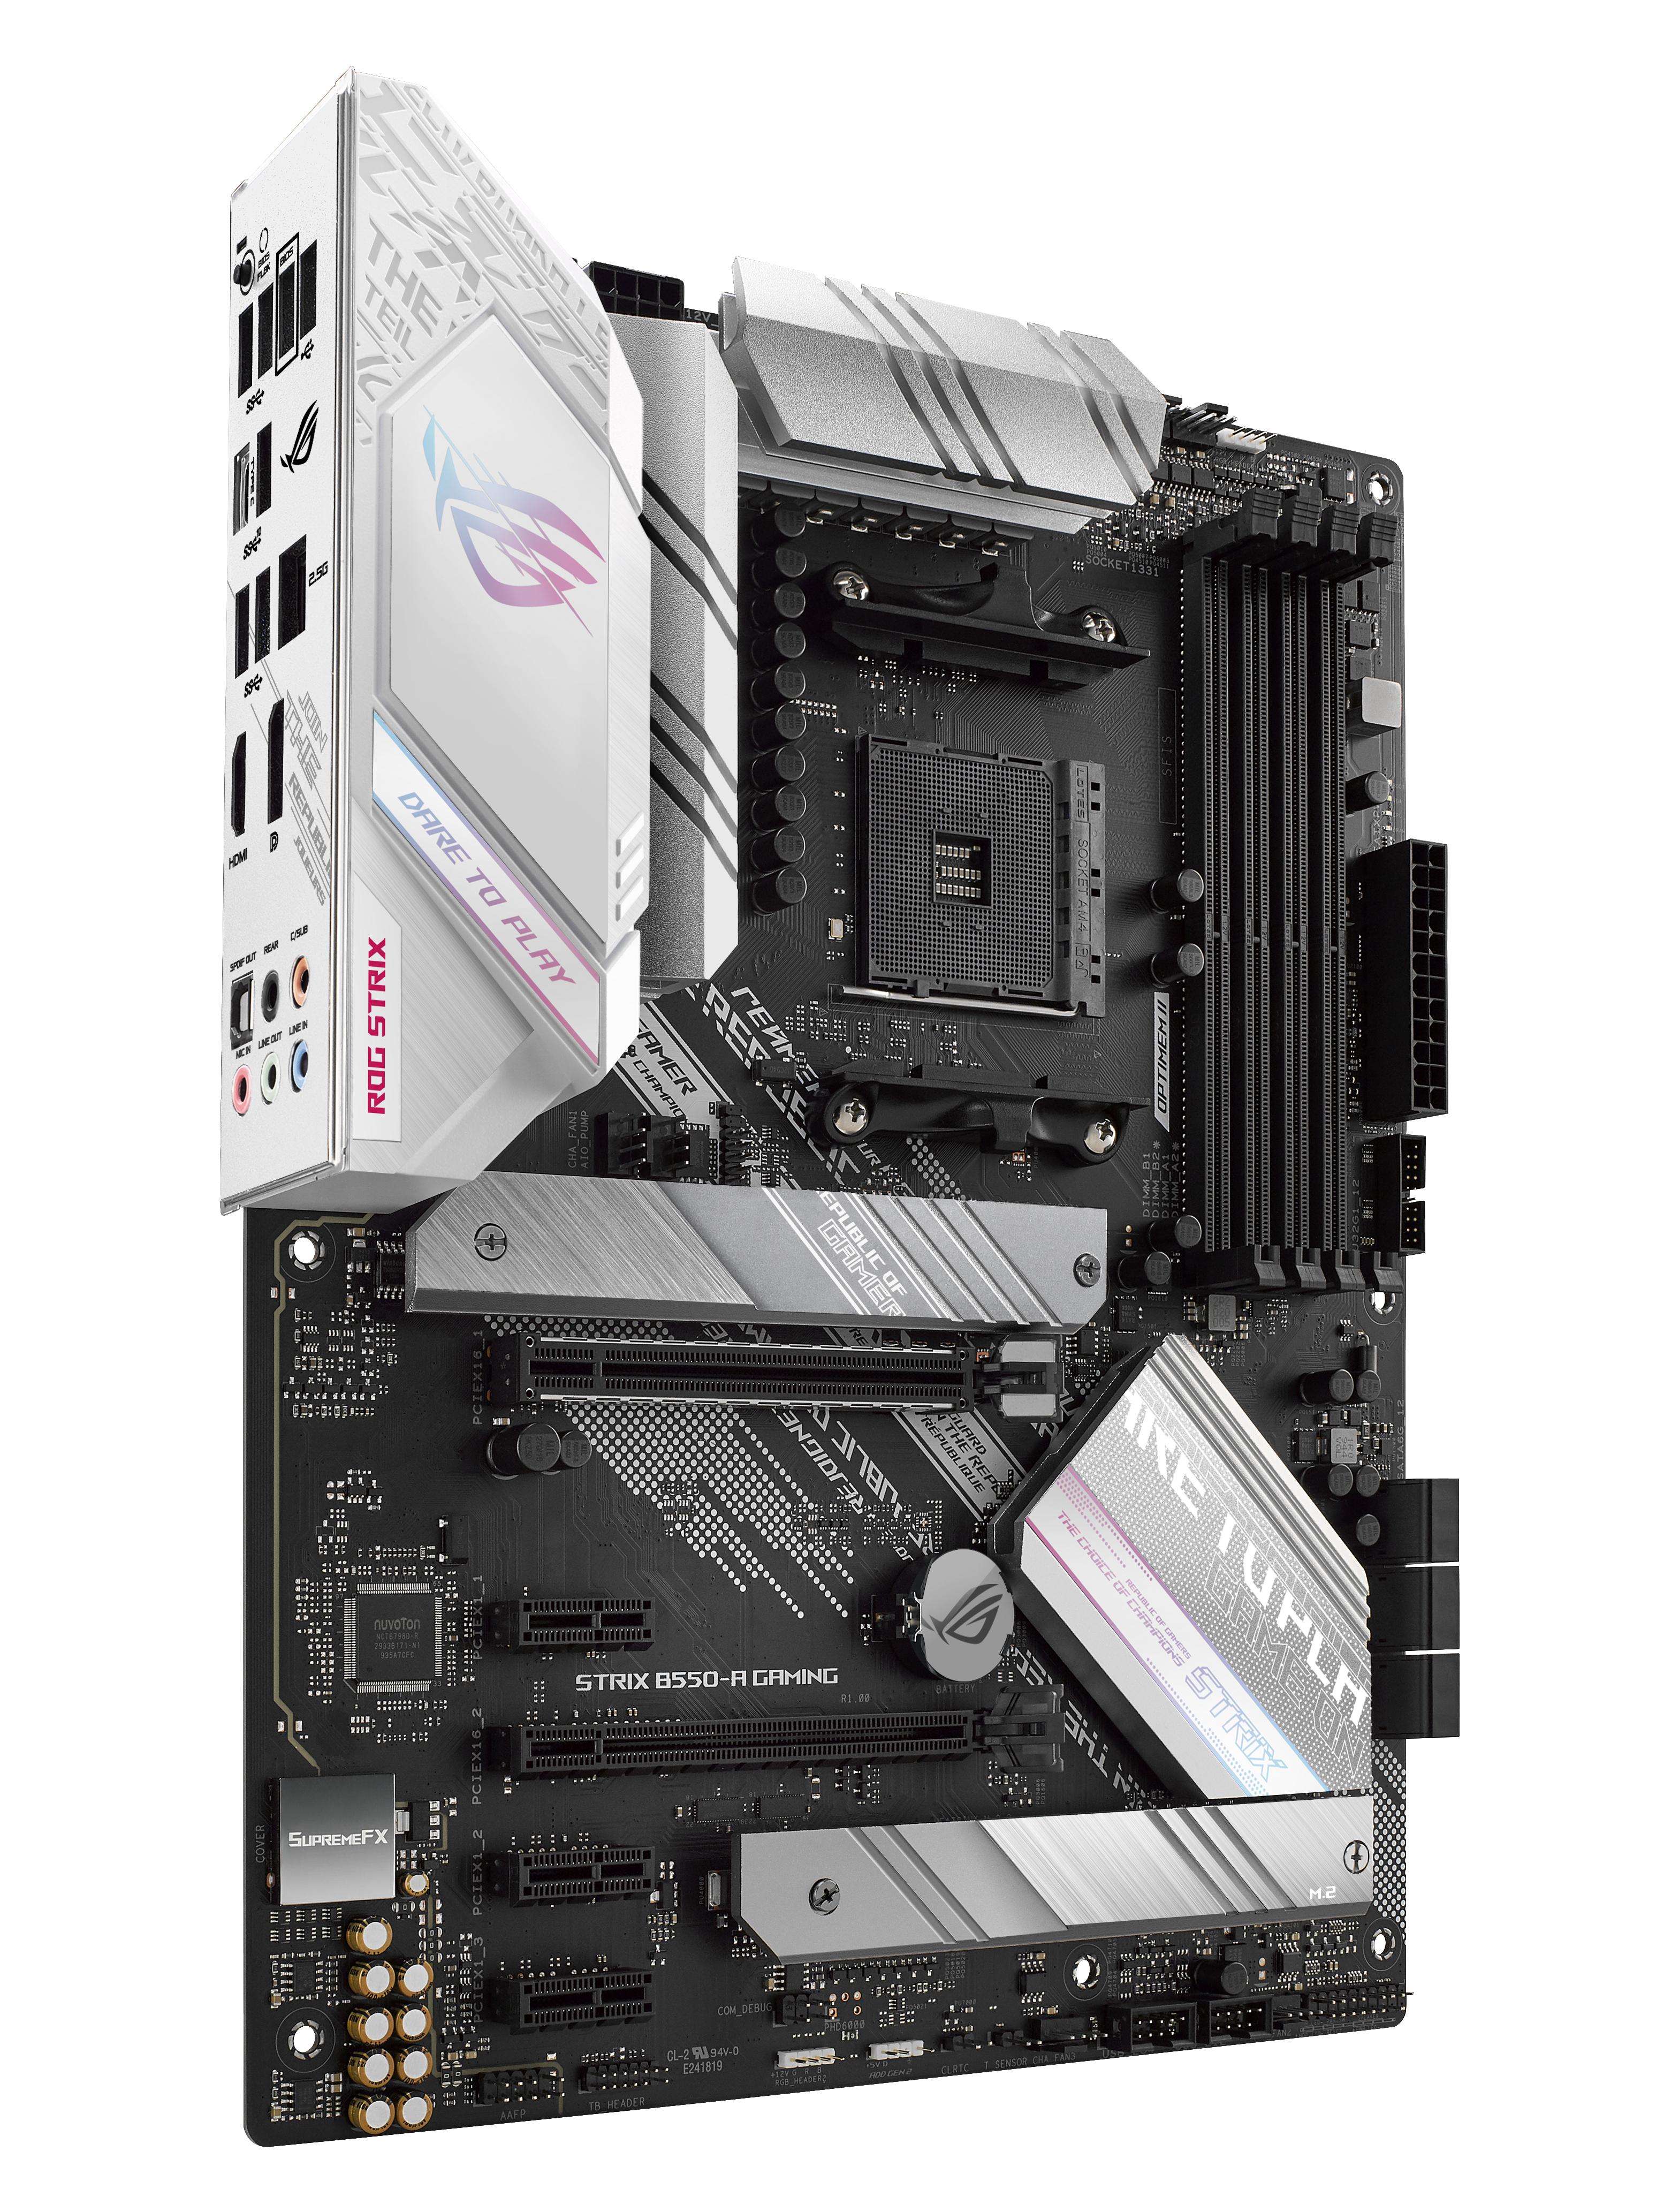 ASUS ROG STRIX B550-A GAMING - Motherboard - ATX - Socket AM4 - AMD B550 - USB-C Gen2, USB 3.2 Gen 1, USB 3.2 Gen 2 - 2.5 Gigabit LAN - Onboard-Grafik (CPU erforderlich)